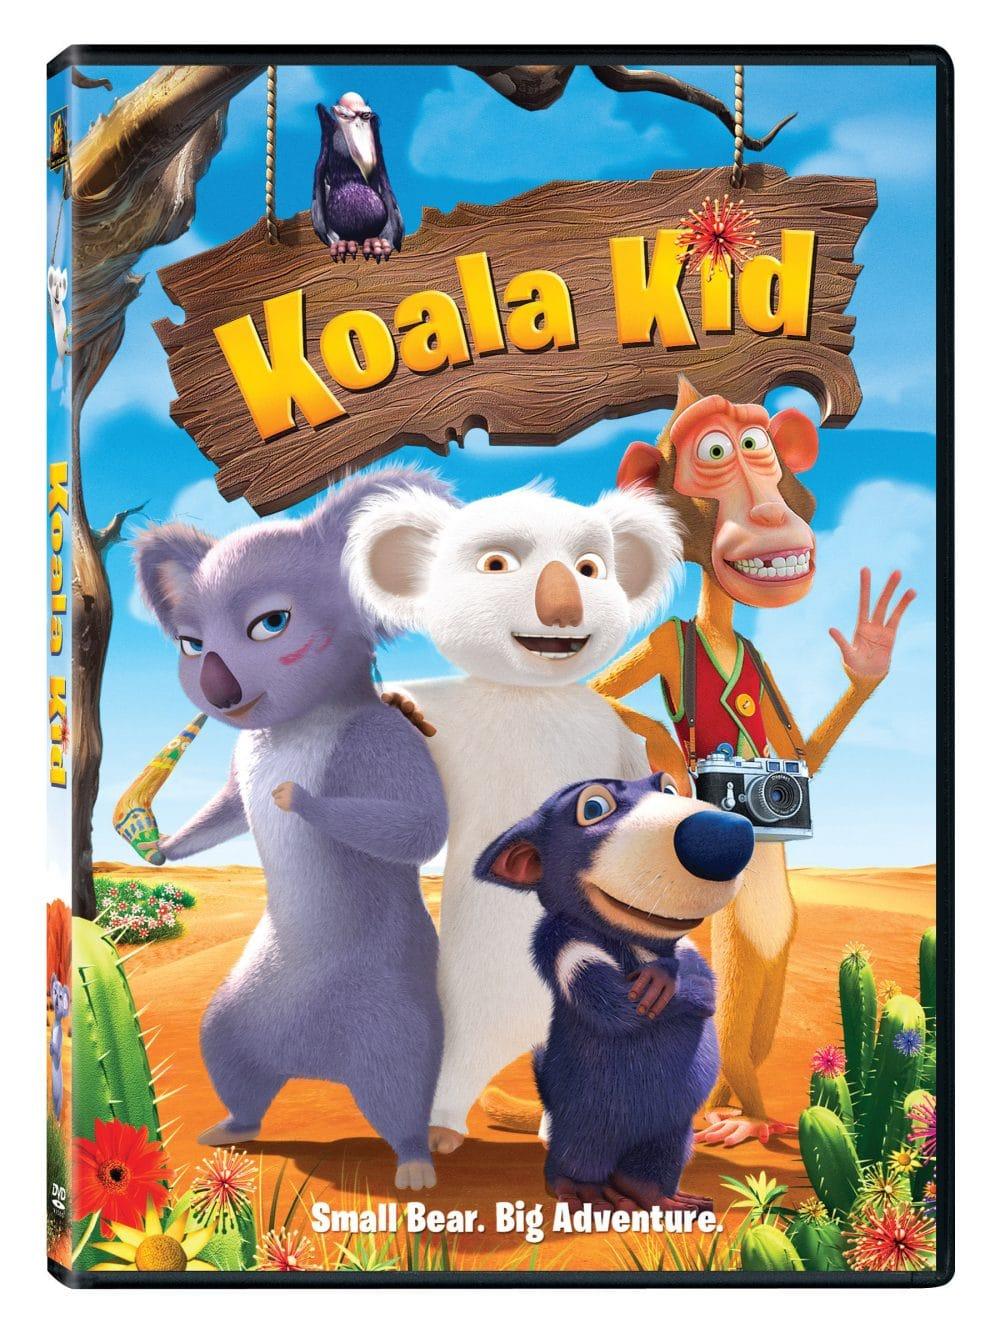 Koalakiddvdspine